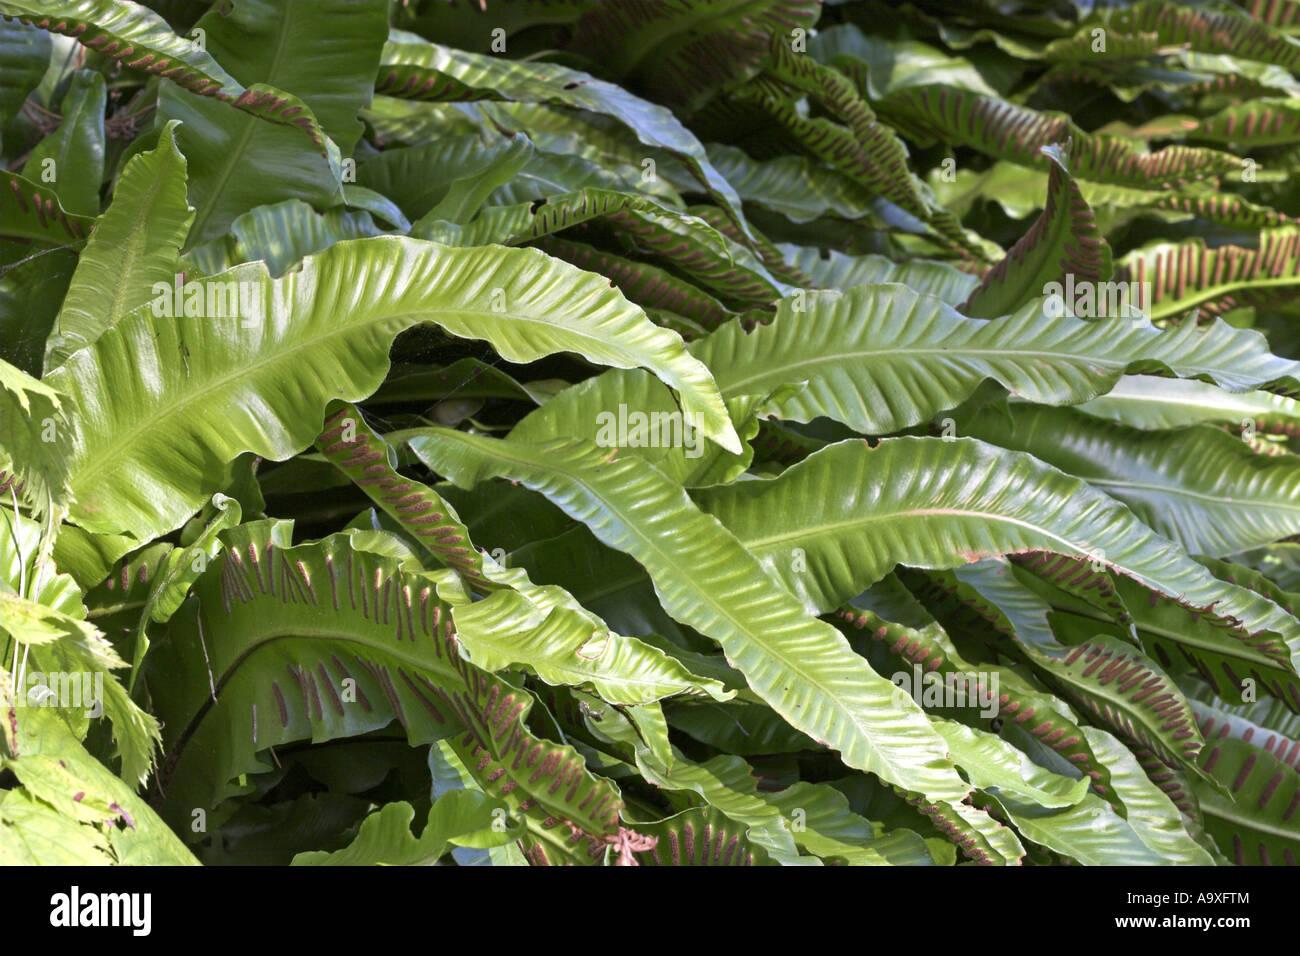 harts tongue European hartstongue fern Asplenium scolopendrium